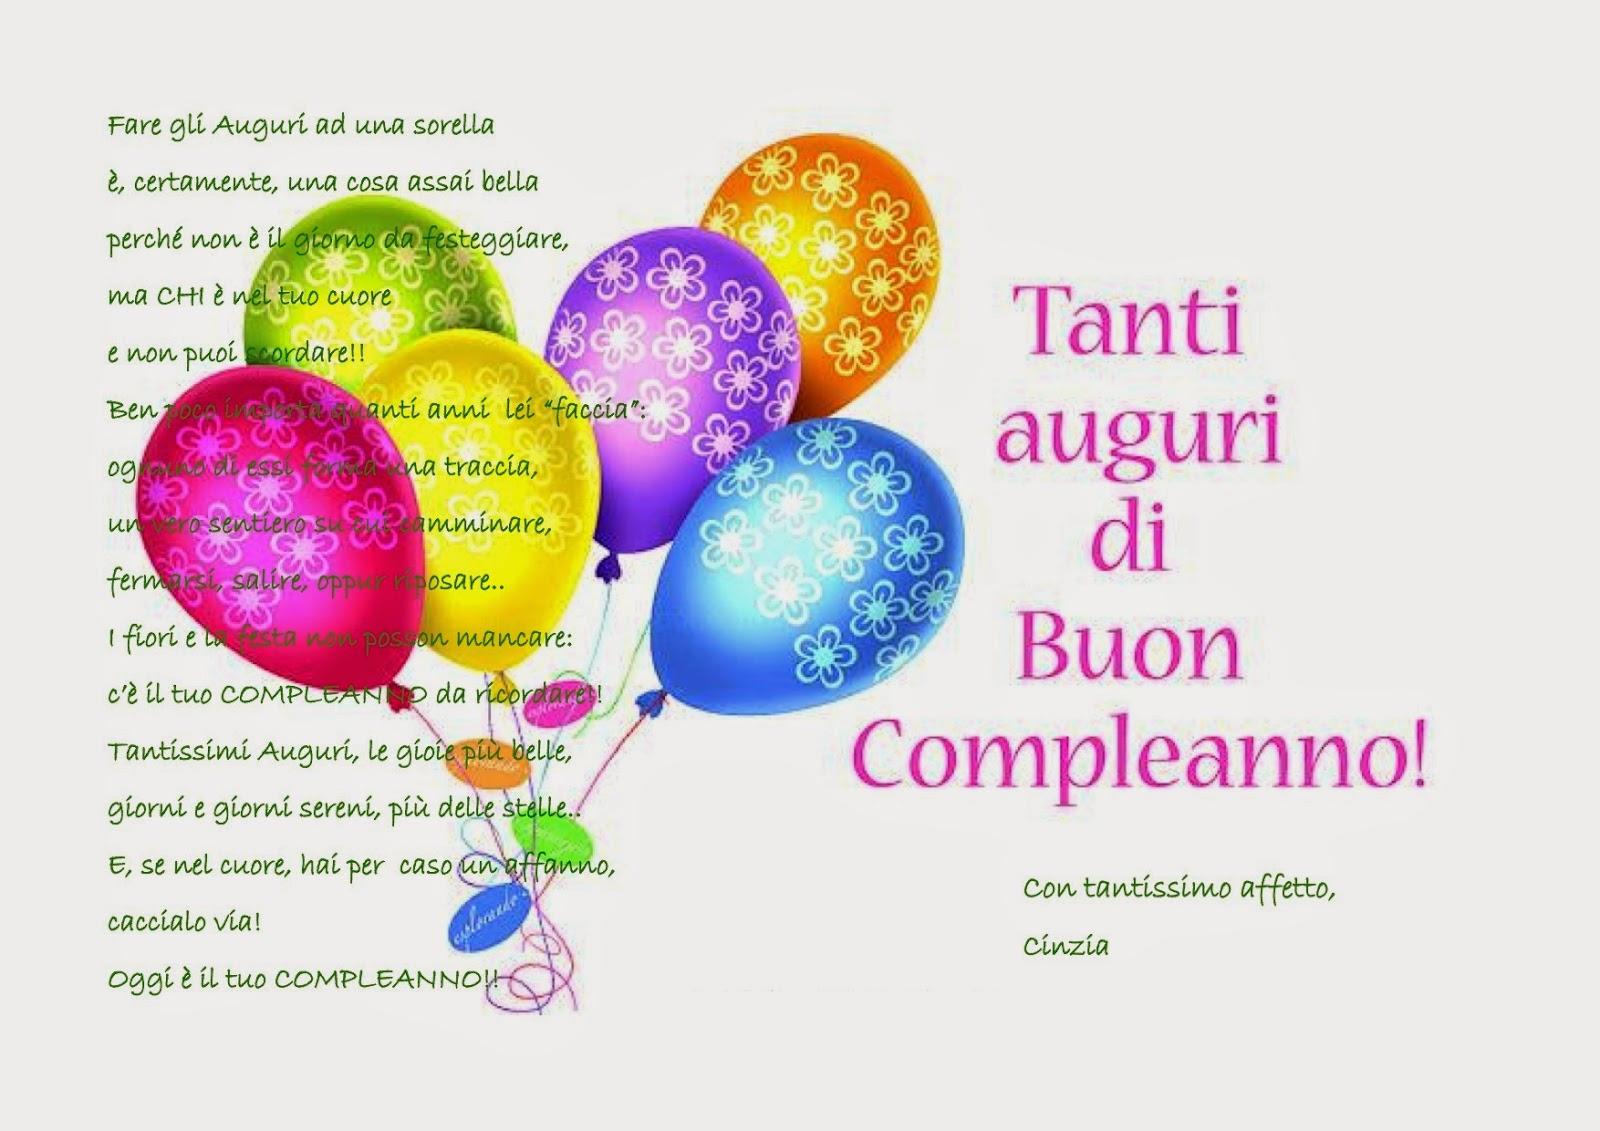 Compleanno Della Mia Sorella Parquetfloor